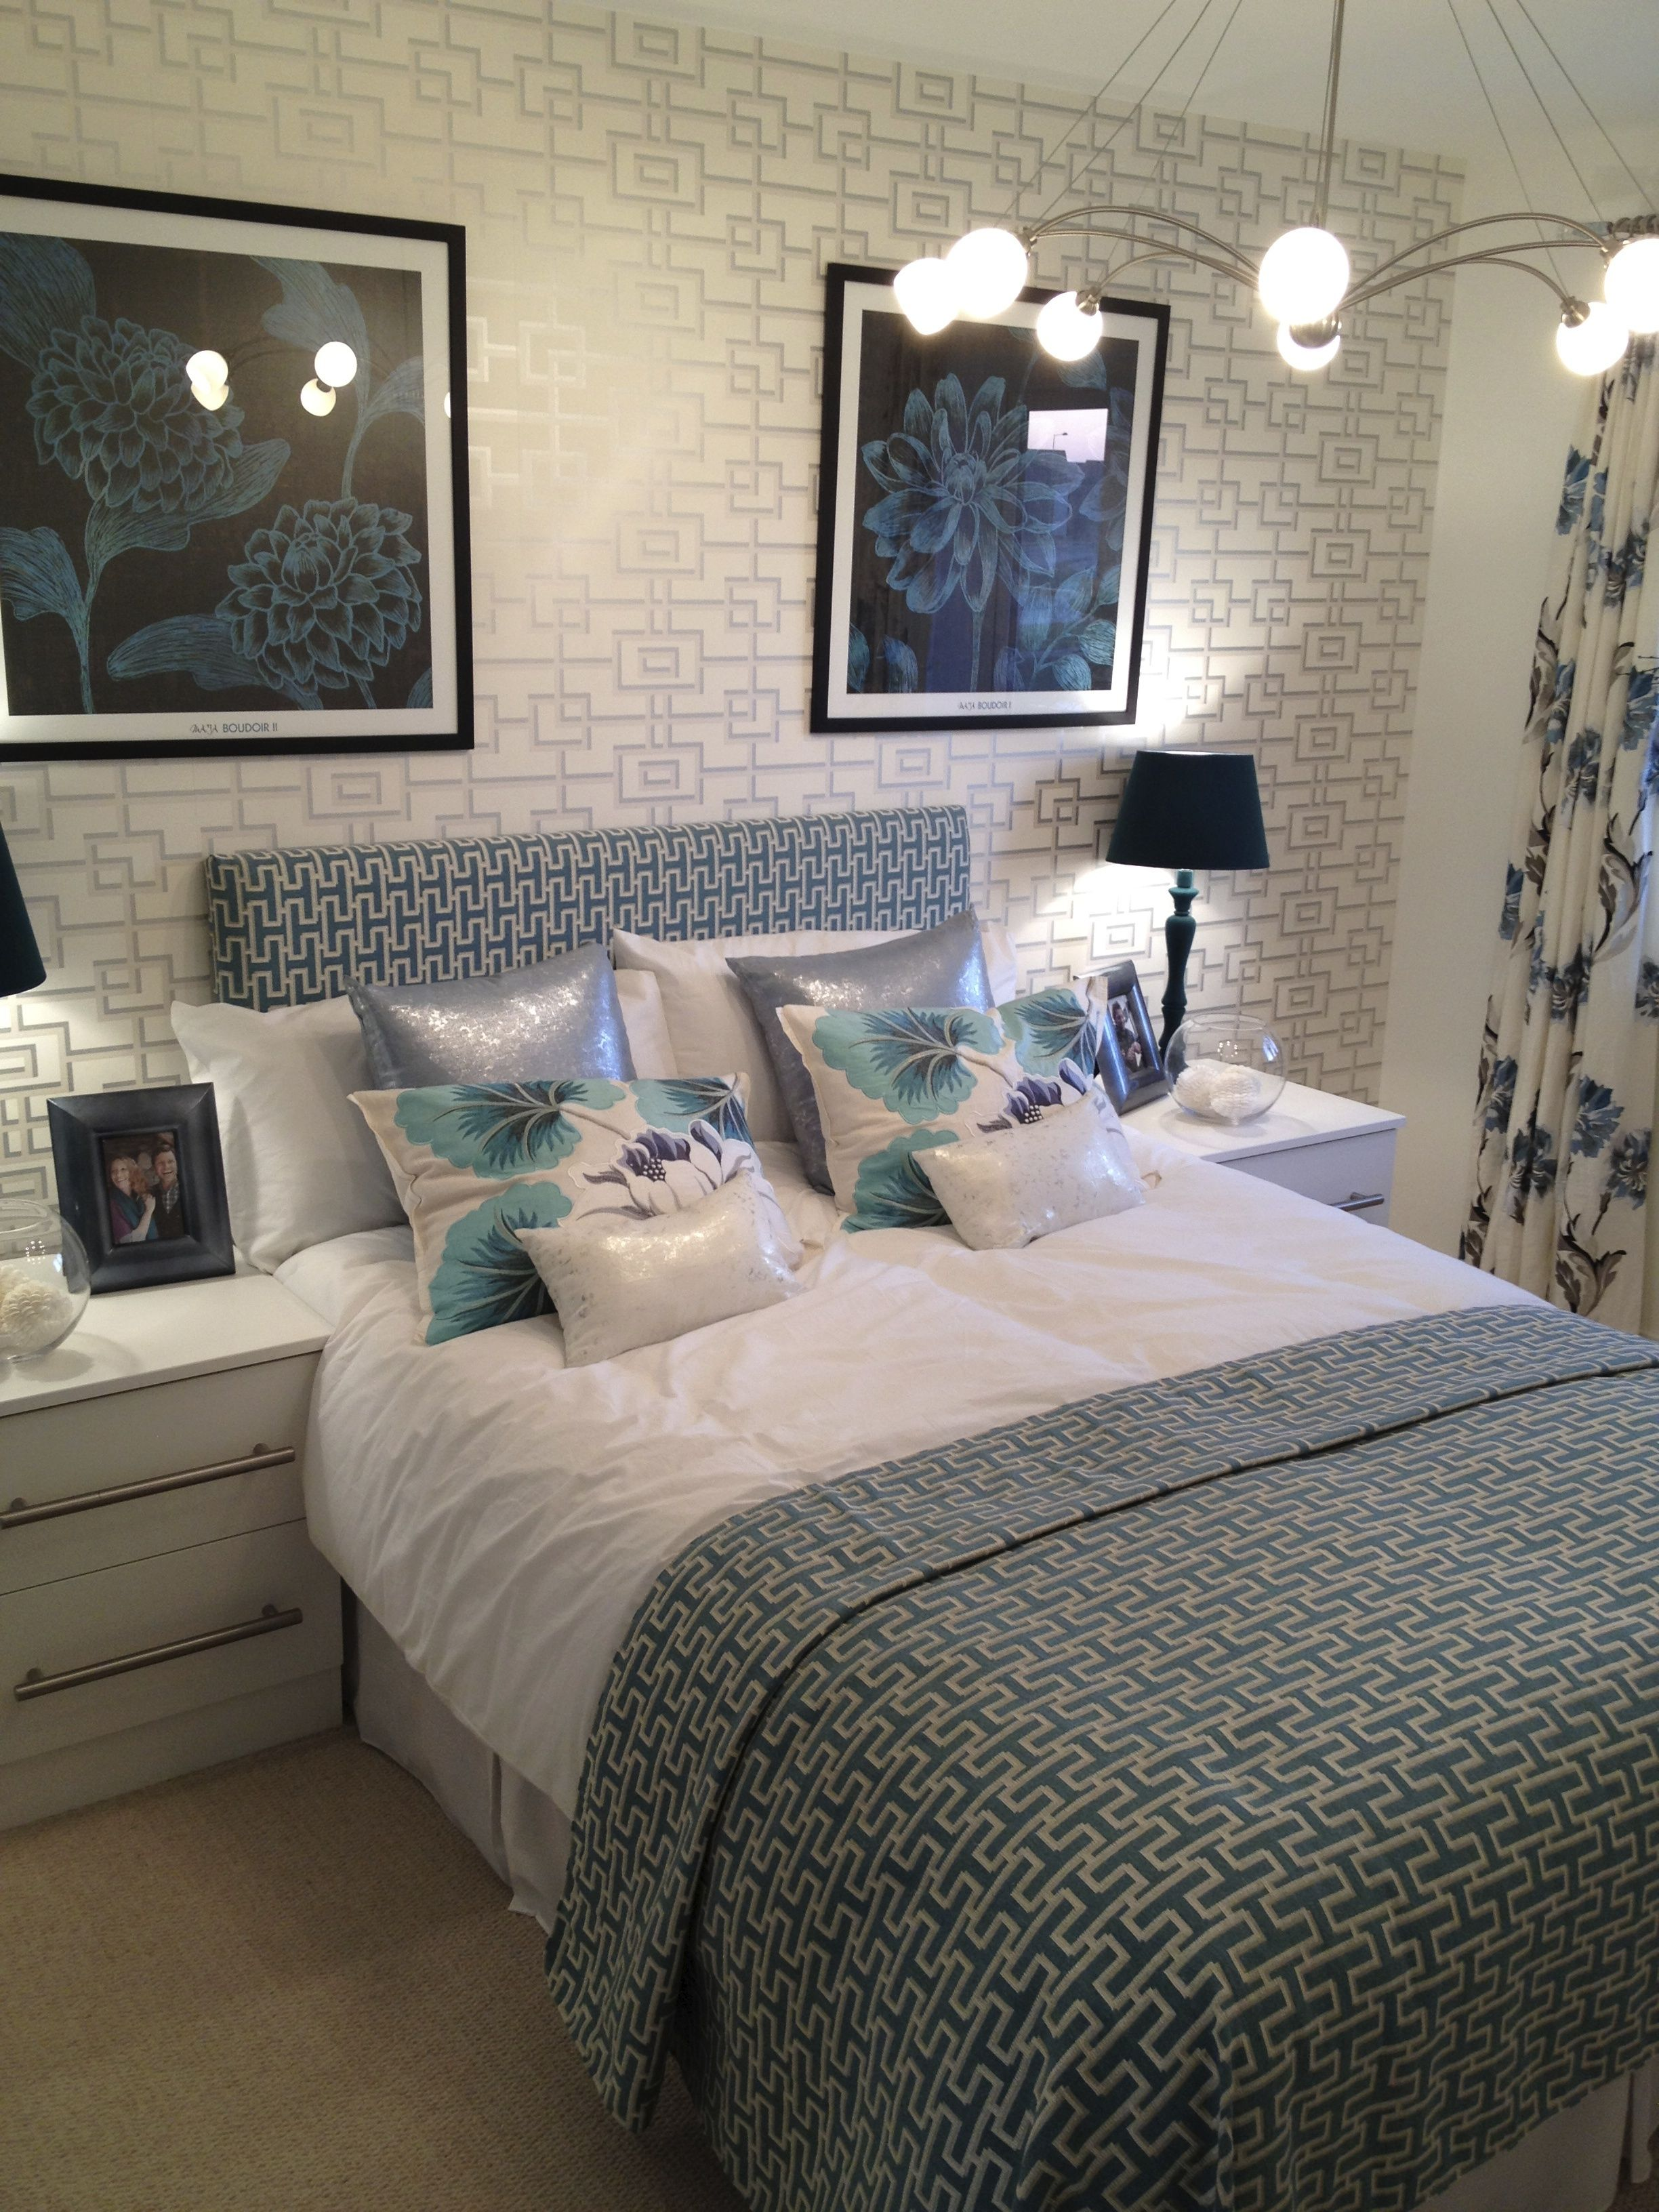 Show Home Bedroom Barratt Home Bedroom Showhome Decor Pinterest Home